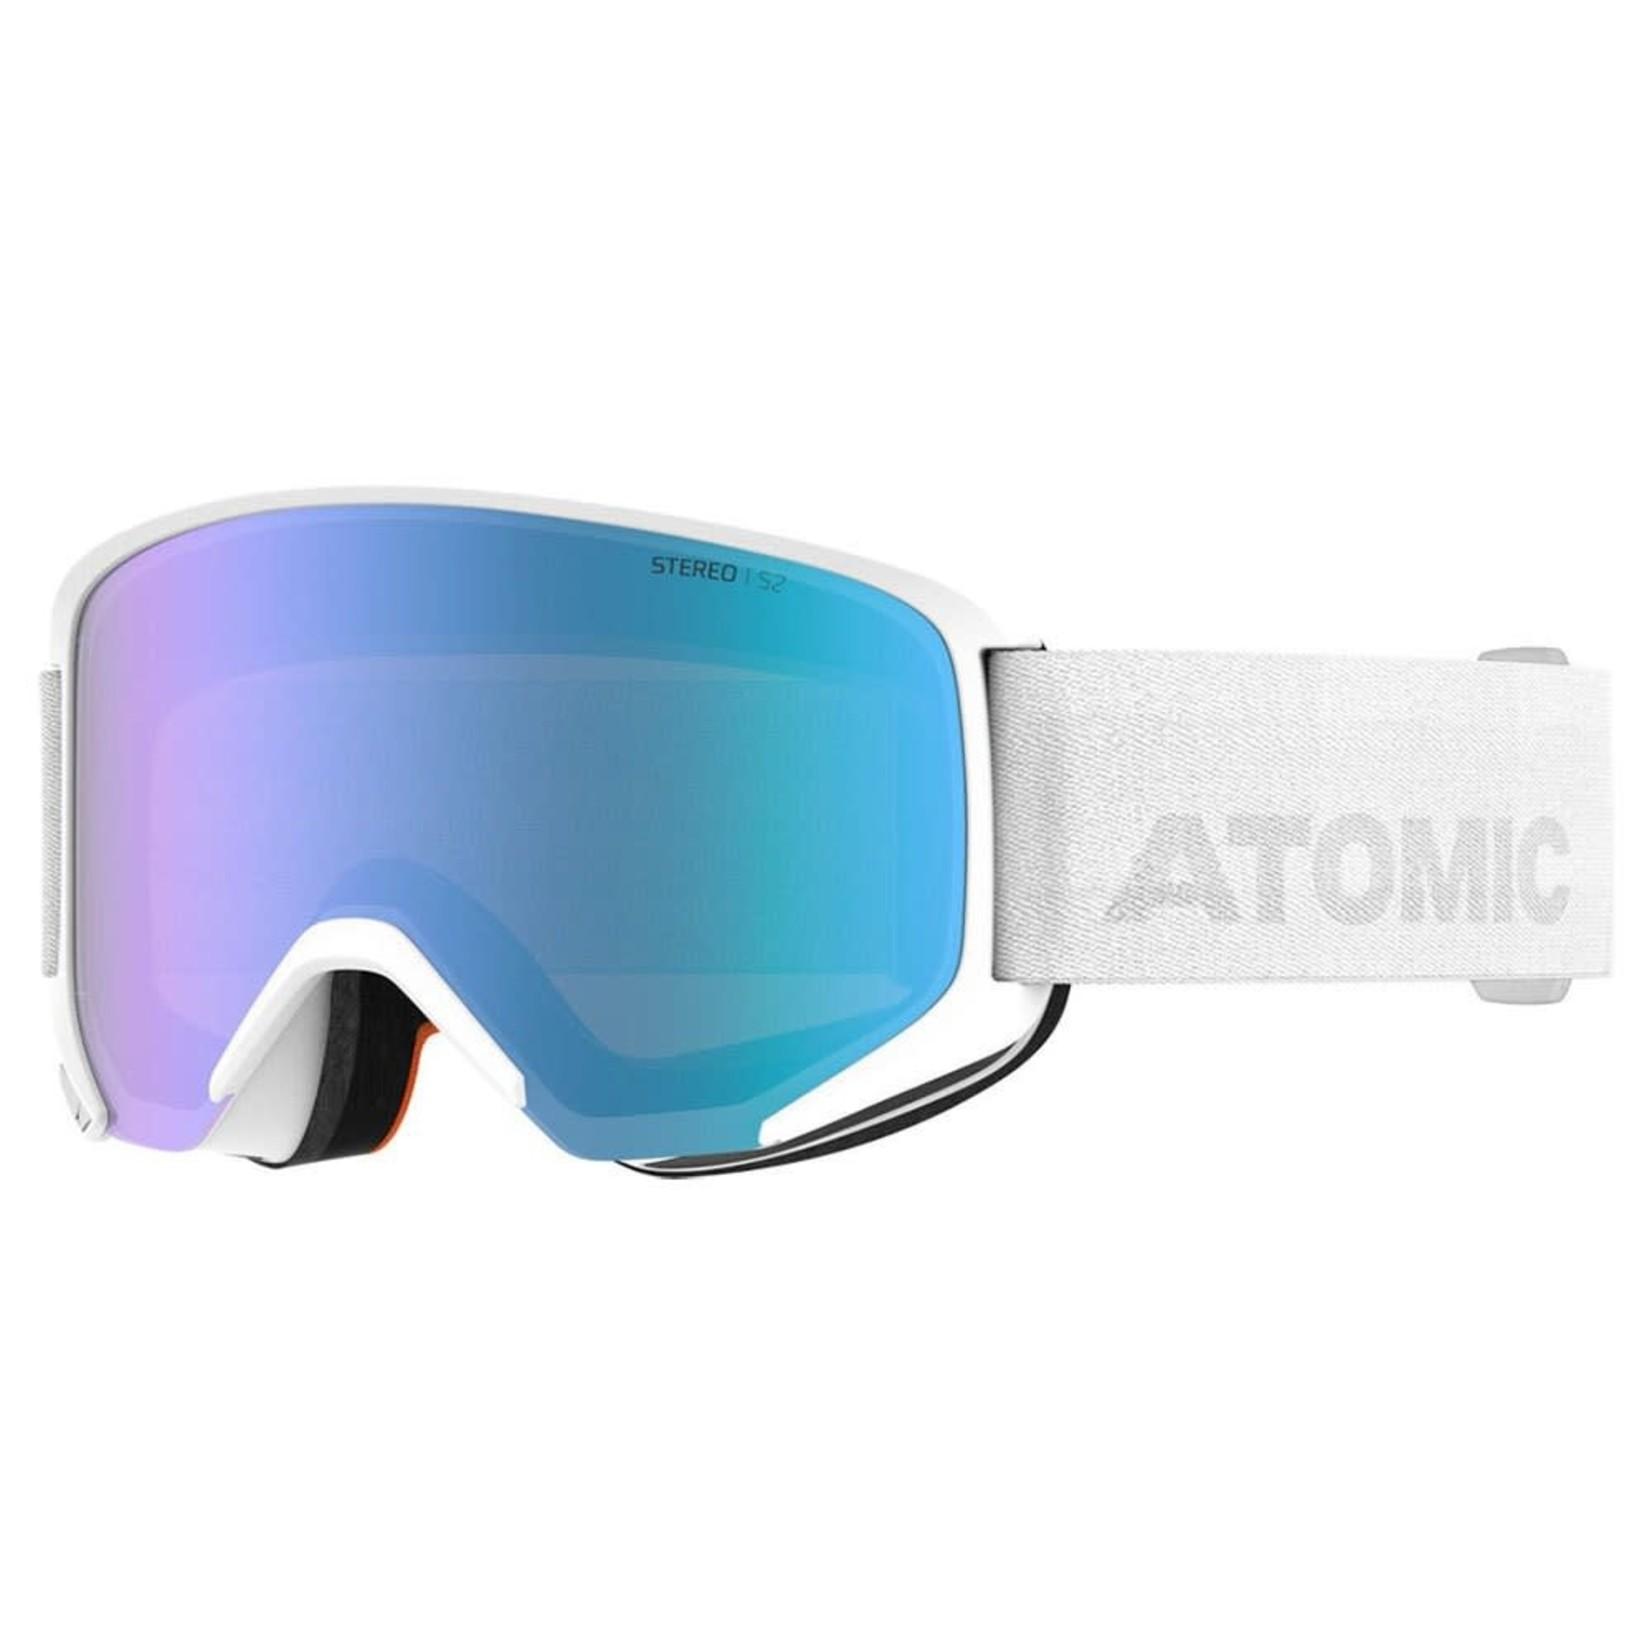 Atomic Atomic Savor Stereo Goggles - Unisex